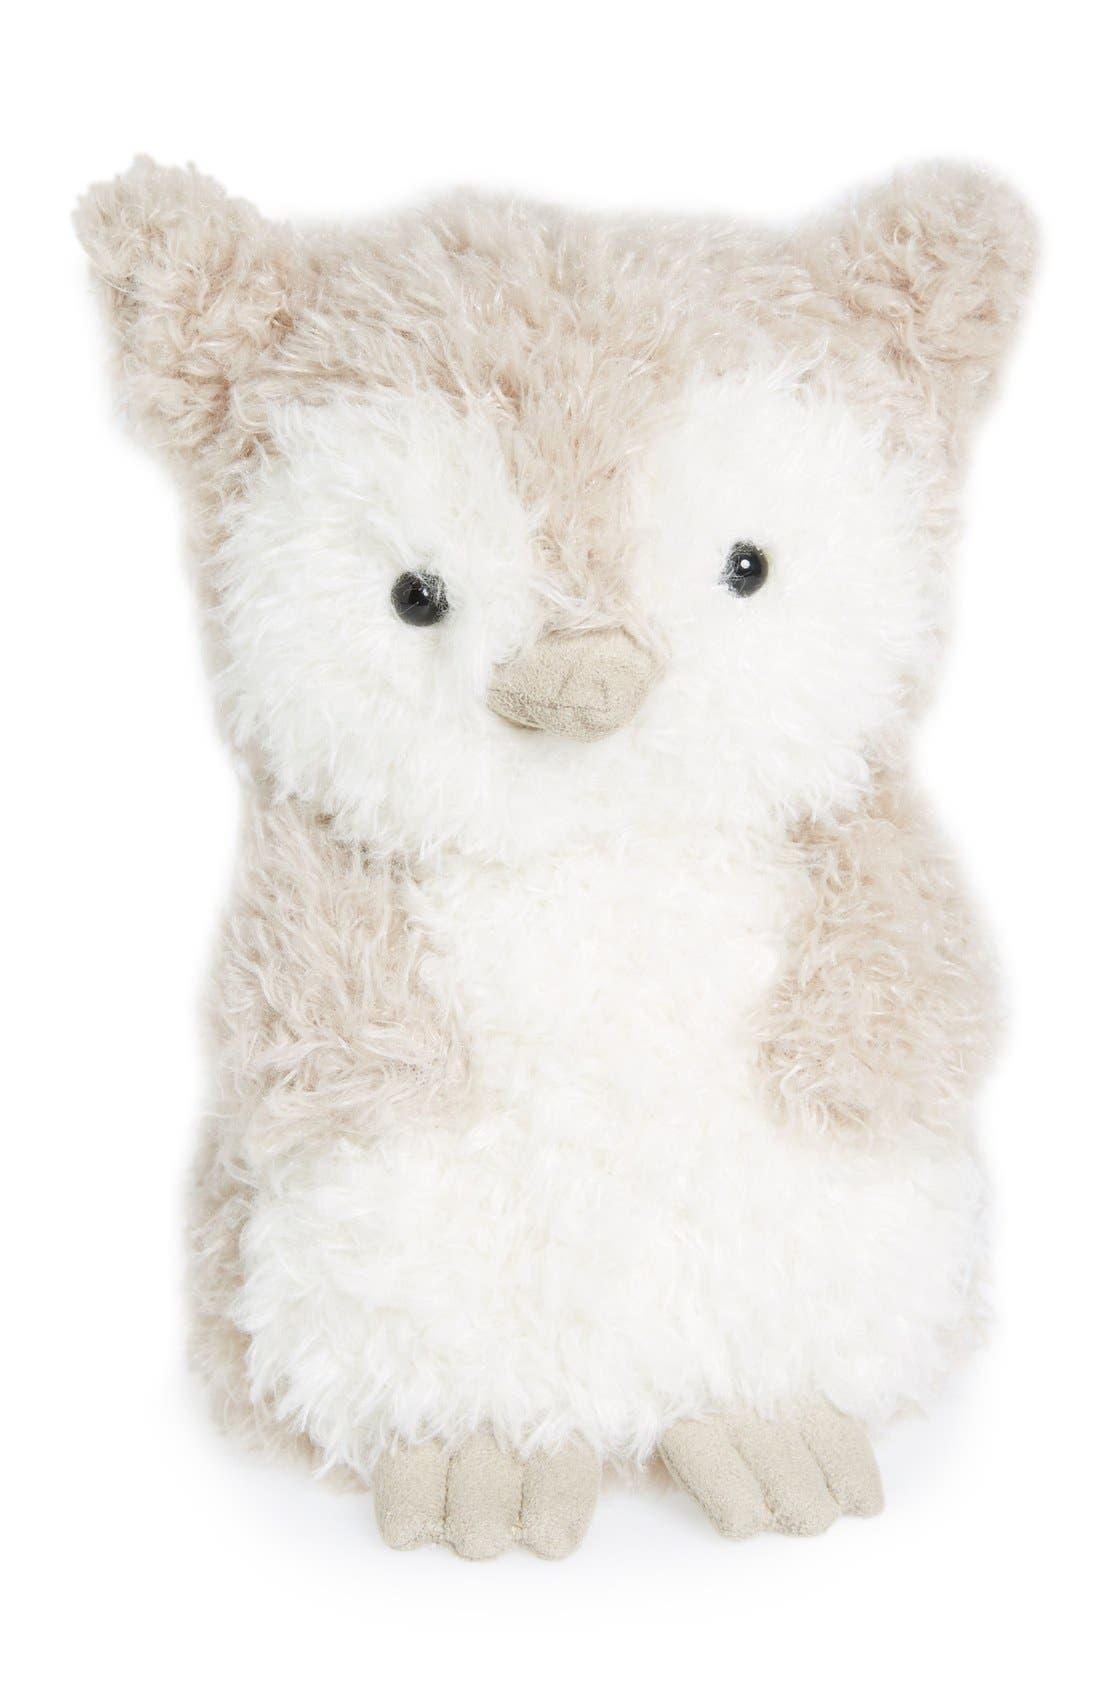 'Wake Up Little Owl' Stuffed Animal,                         Main,                         color, Grey